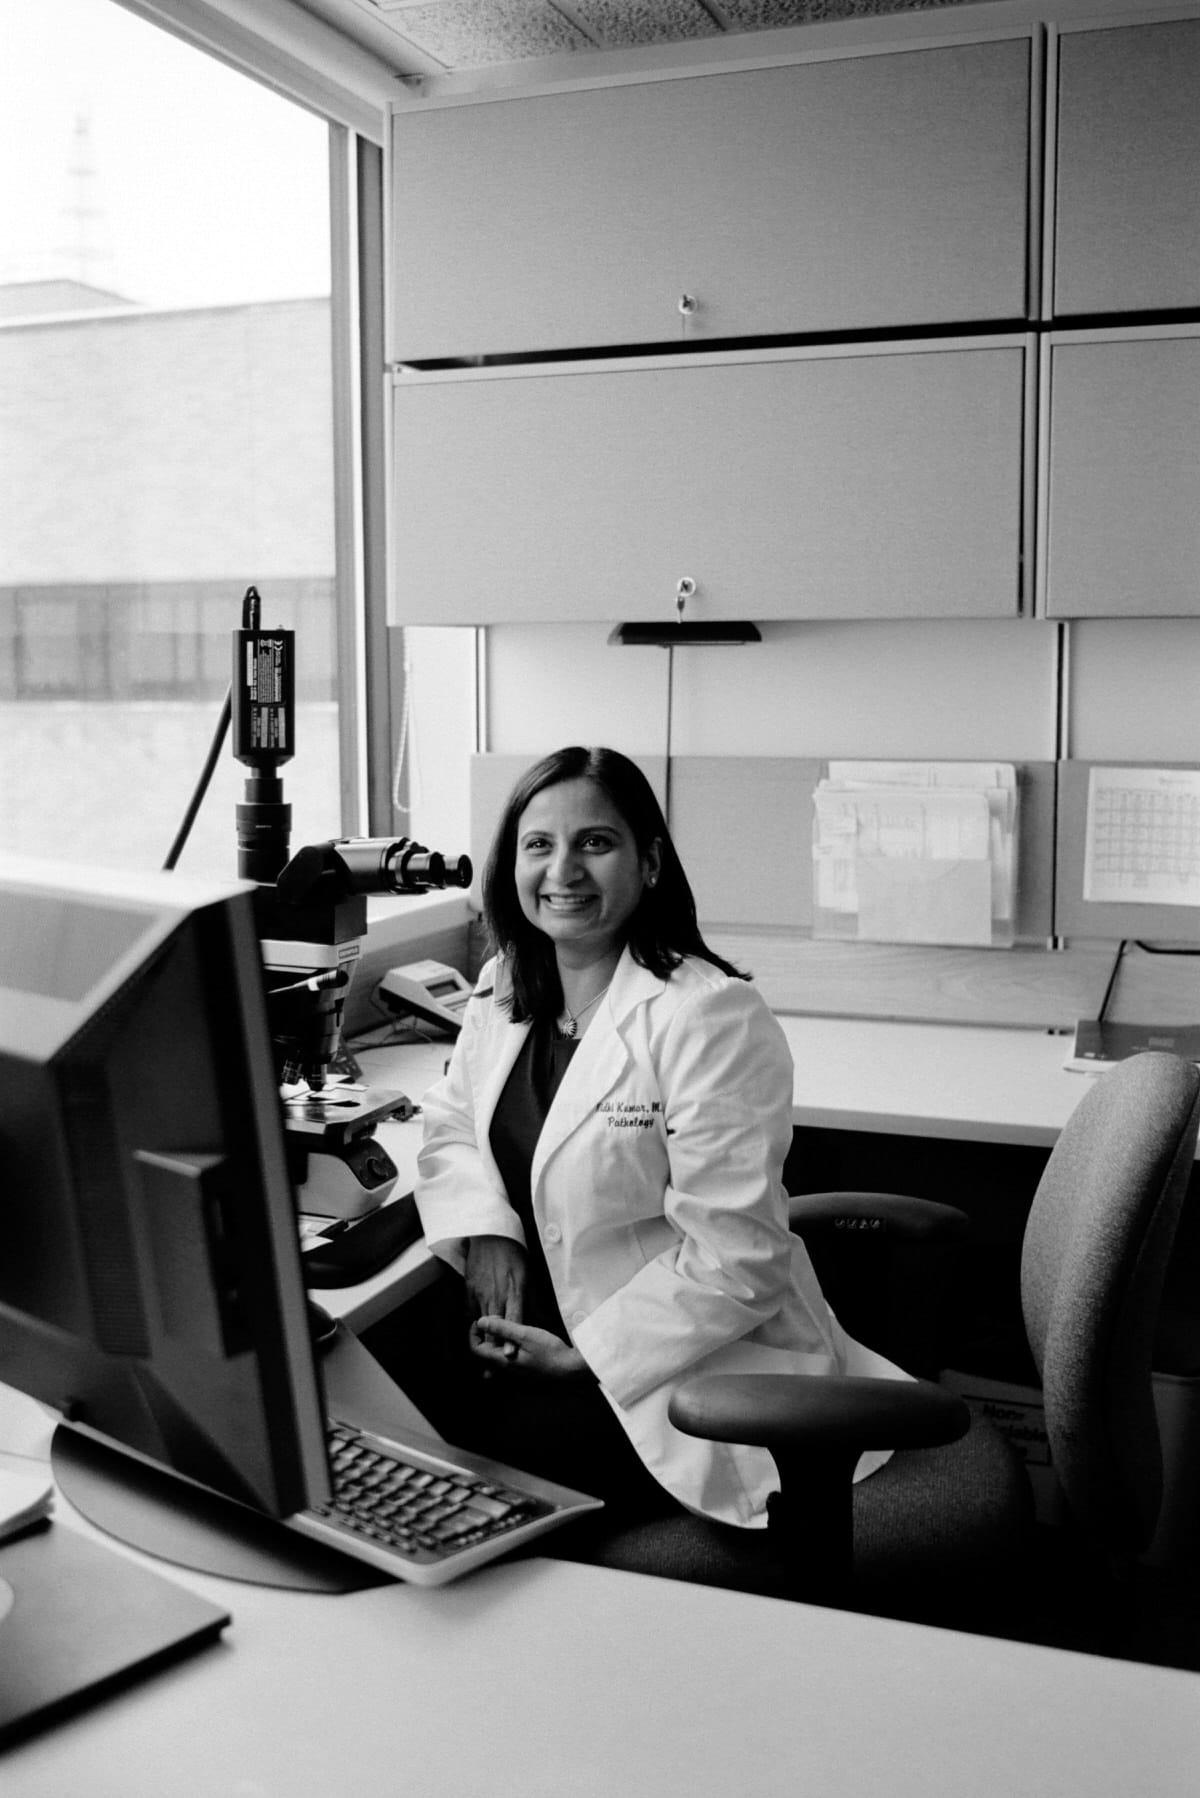 Illuminating-women_exhibition-black-and-white-fine-art-film-photography-of-Agnesian-Healthcare-pathologist-Nidhi-Kumar-by-Studio-L-photographer-Laura-Schneider-_035